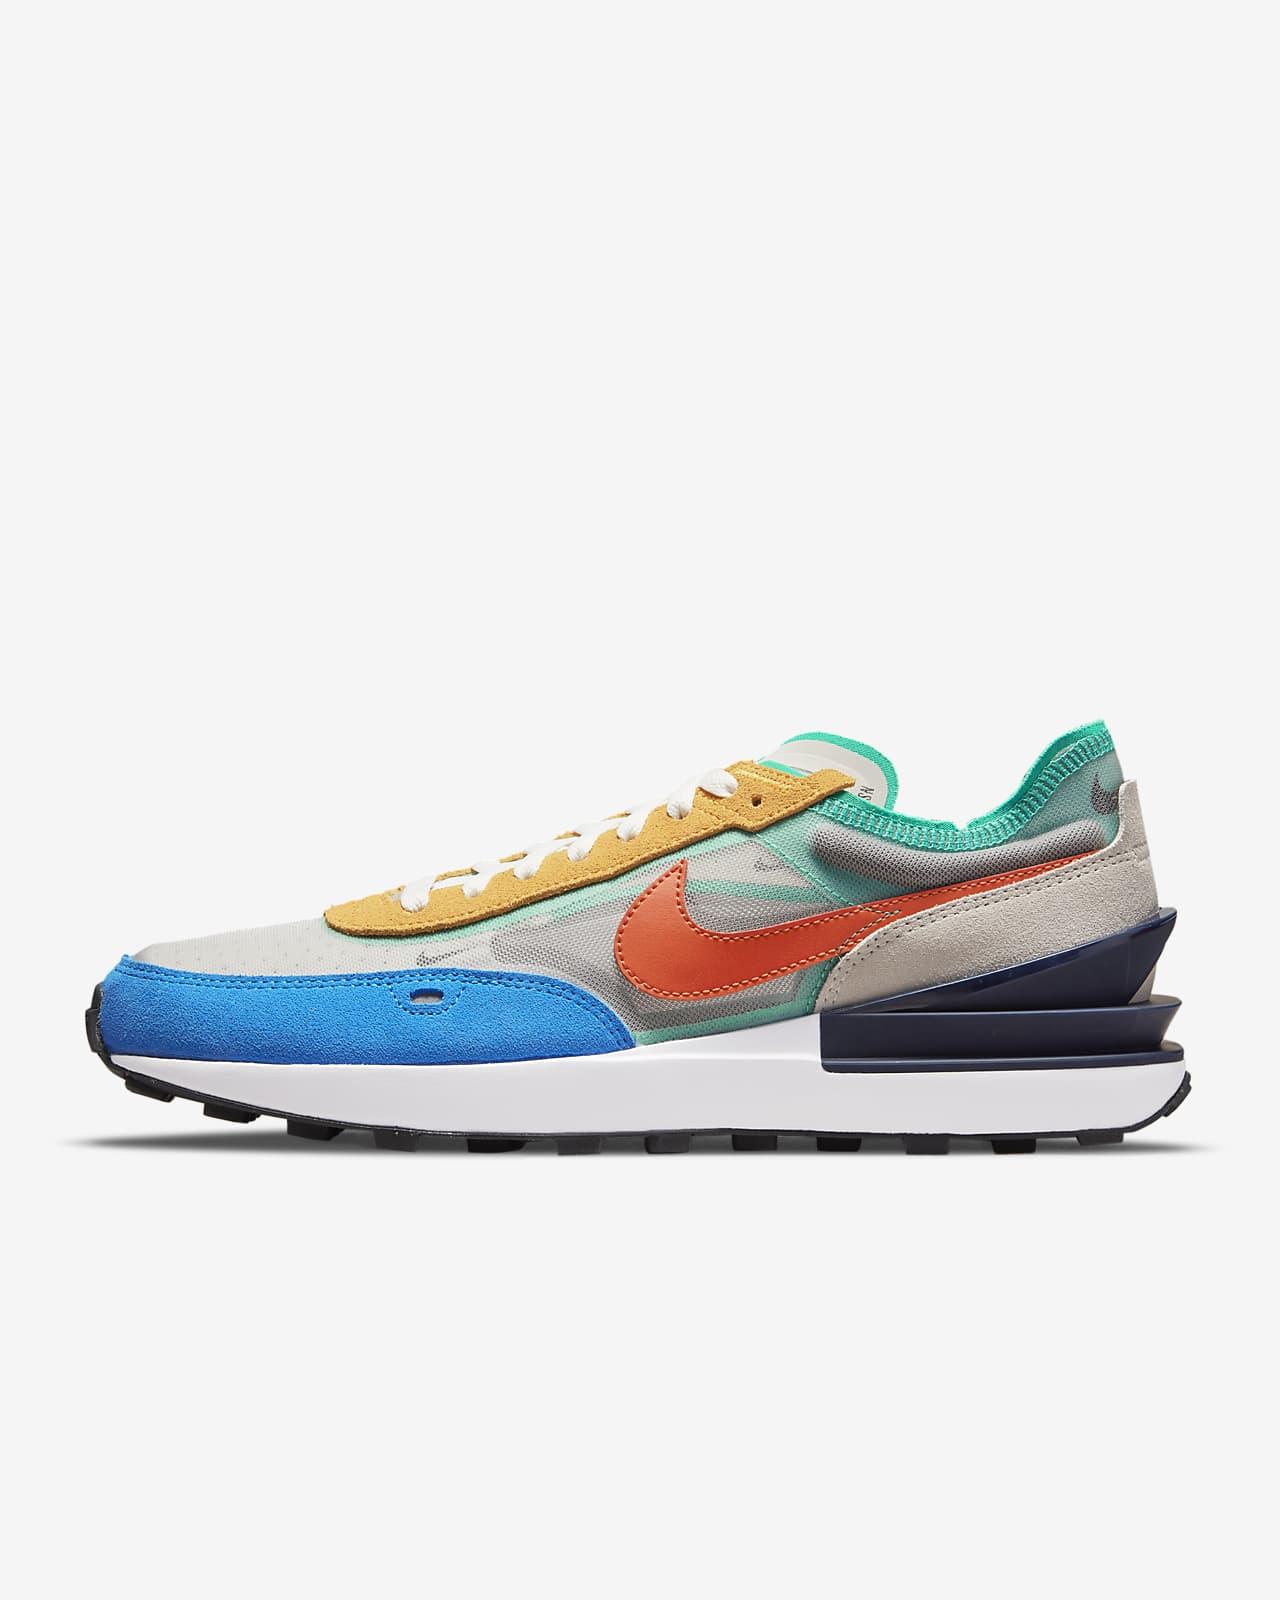 Nike Waffle One Men's Shoes